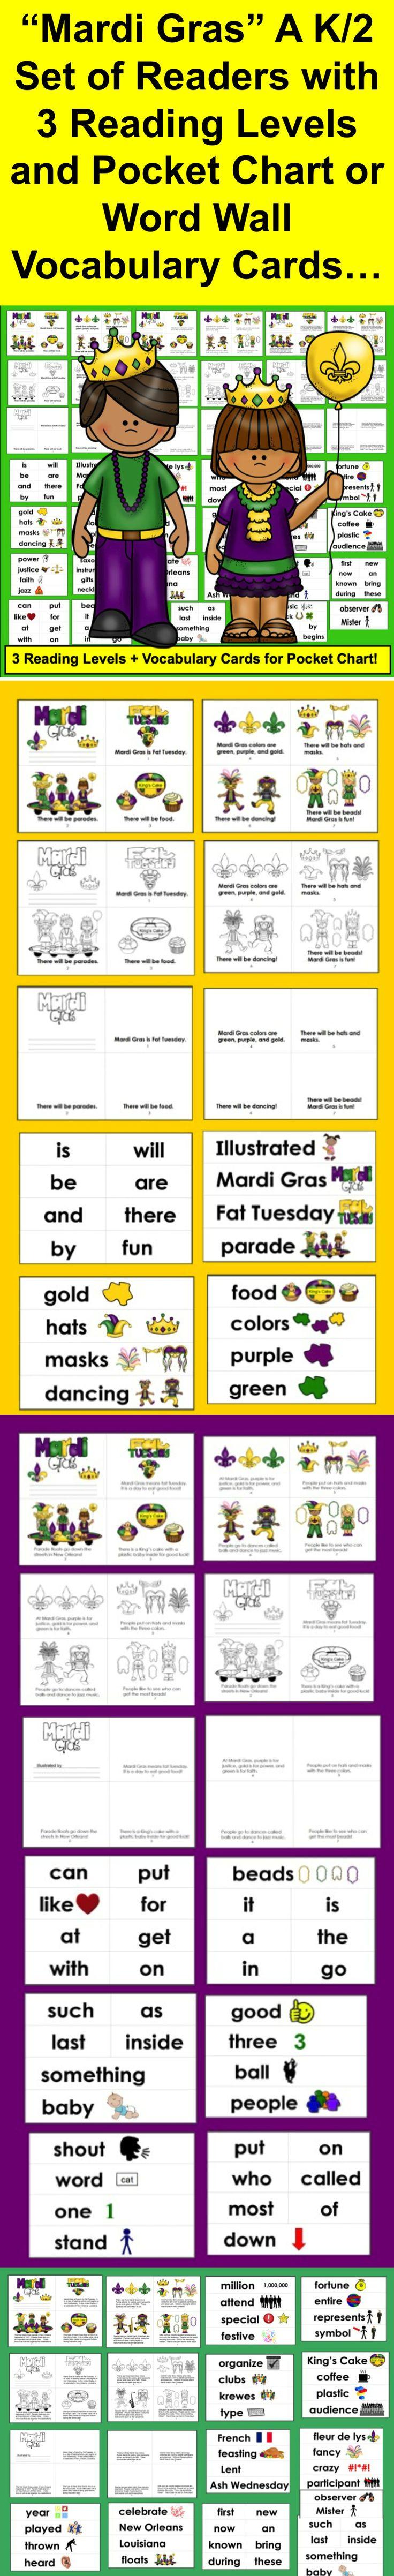 Mardi Gras Activities: Mini Books - 3 Levels + Illustrated Word Wall ...